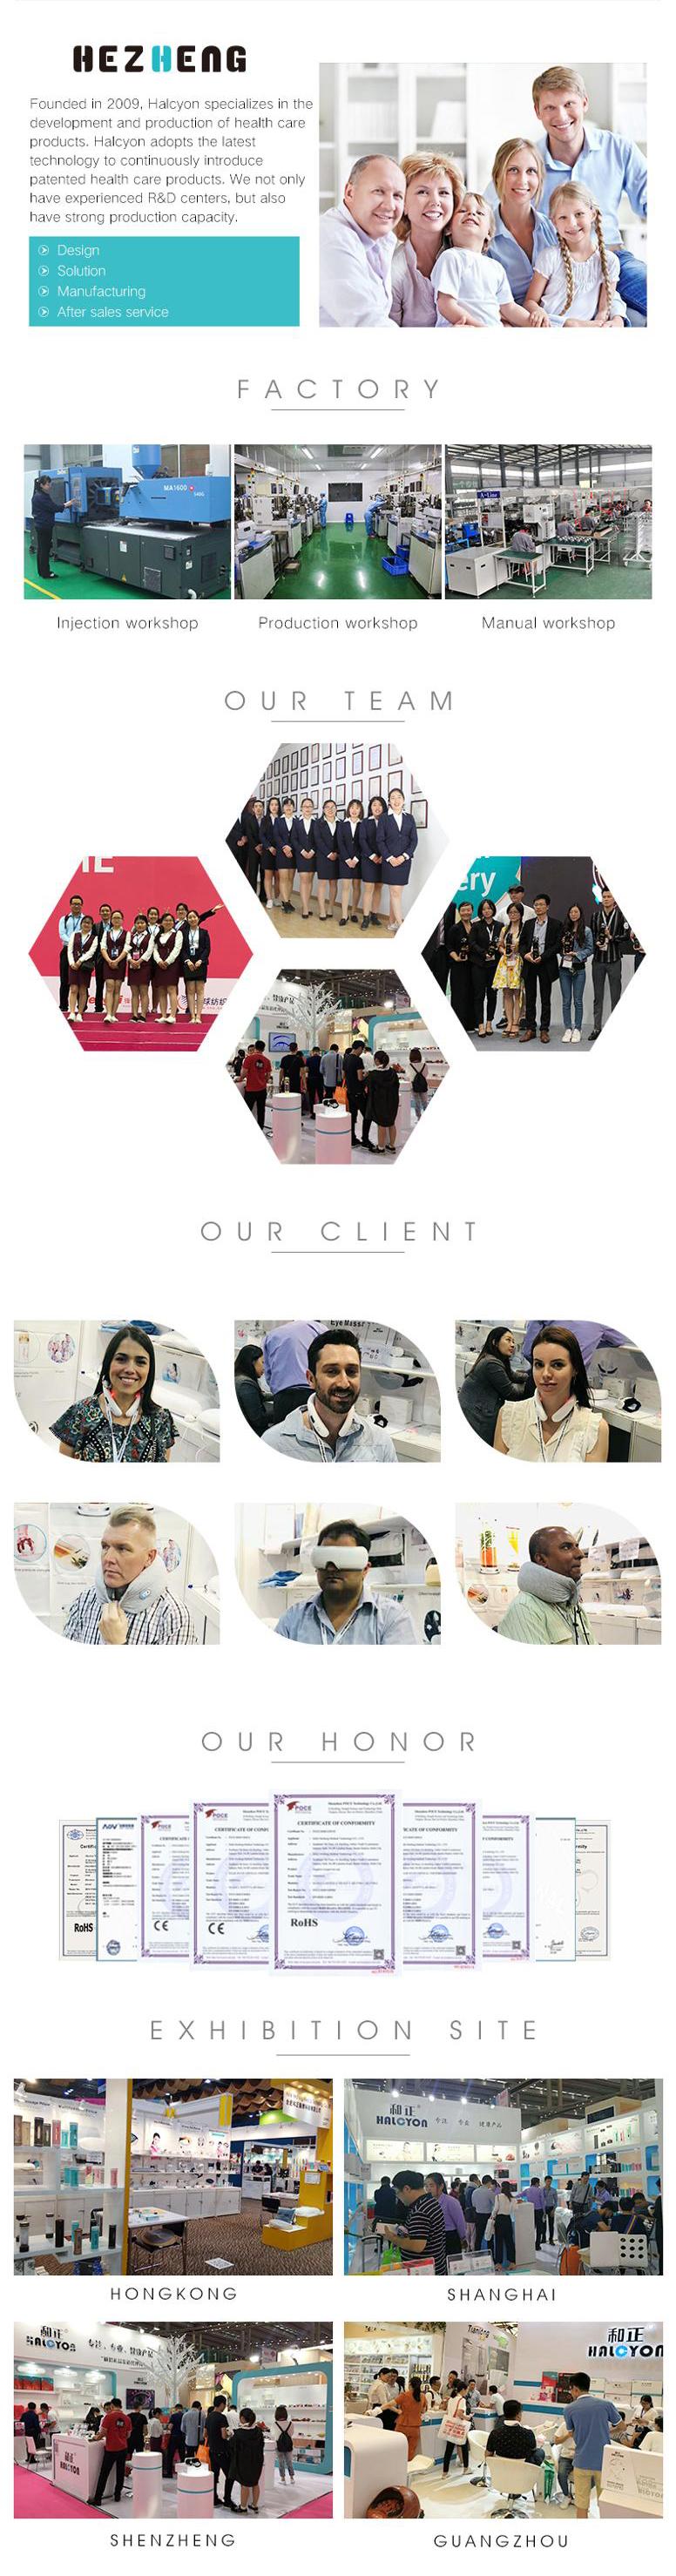 2020 Hot Sale Bluetooth Vibration Wireless Eye Care Massager Electric Eye Mask